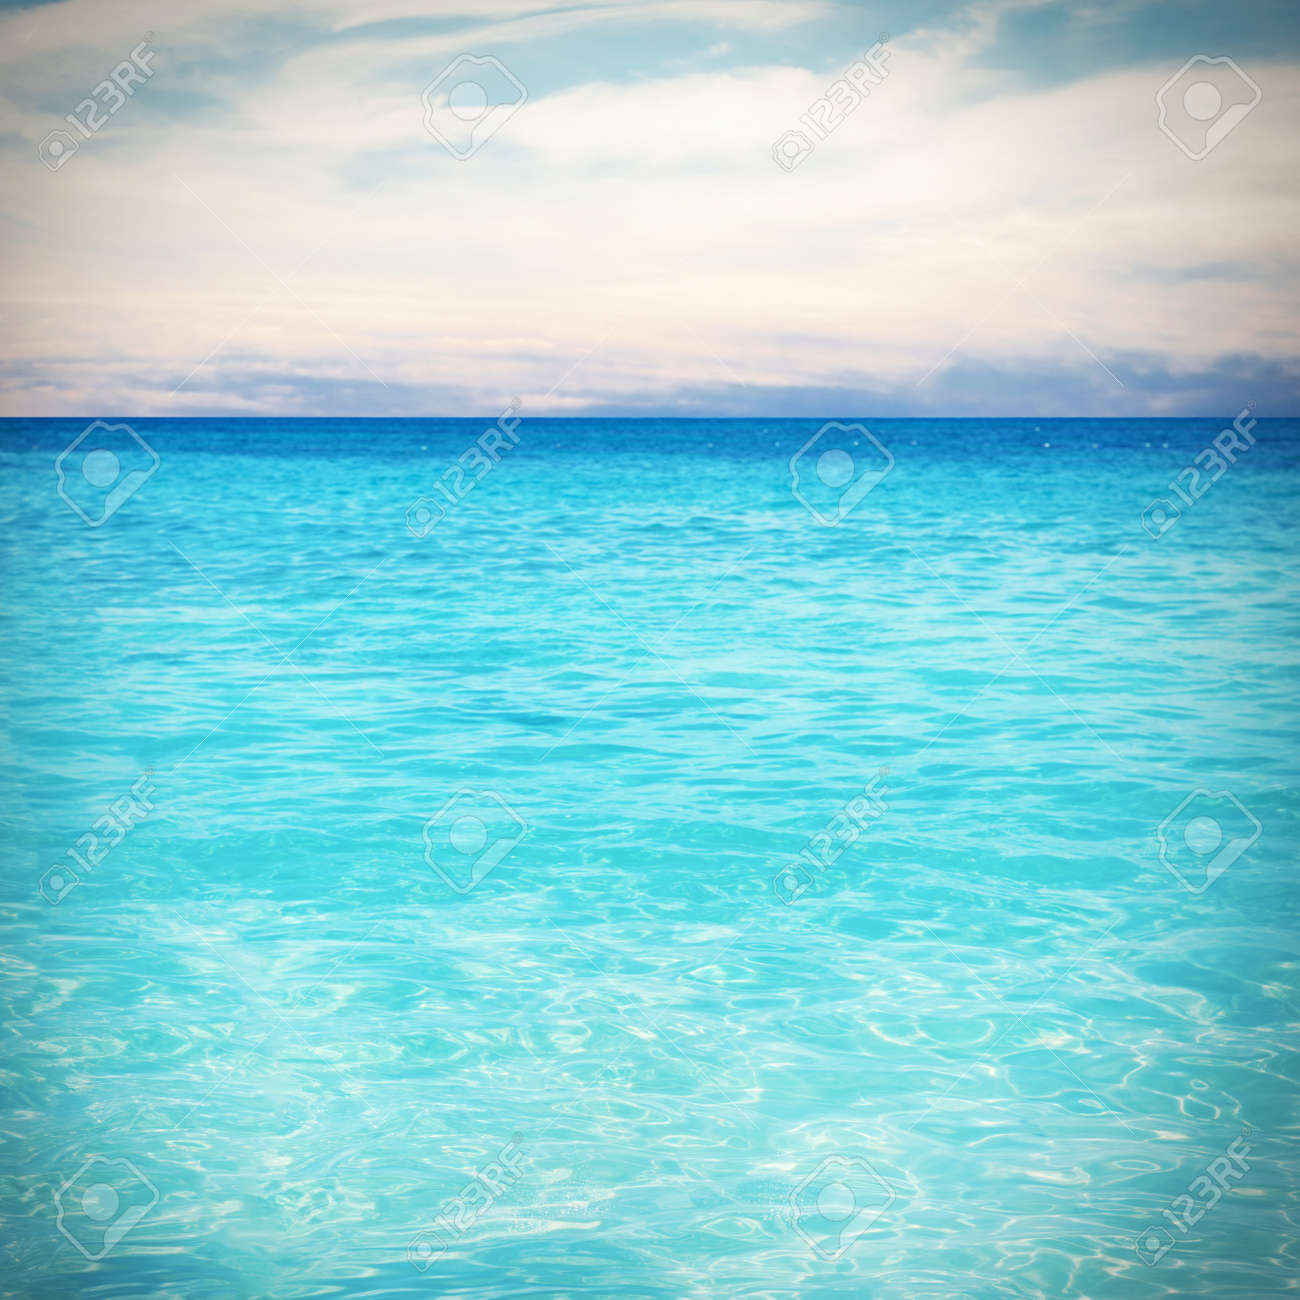 fond-de-mer - Photos